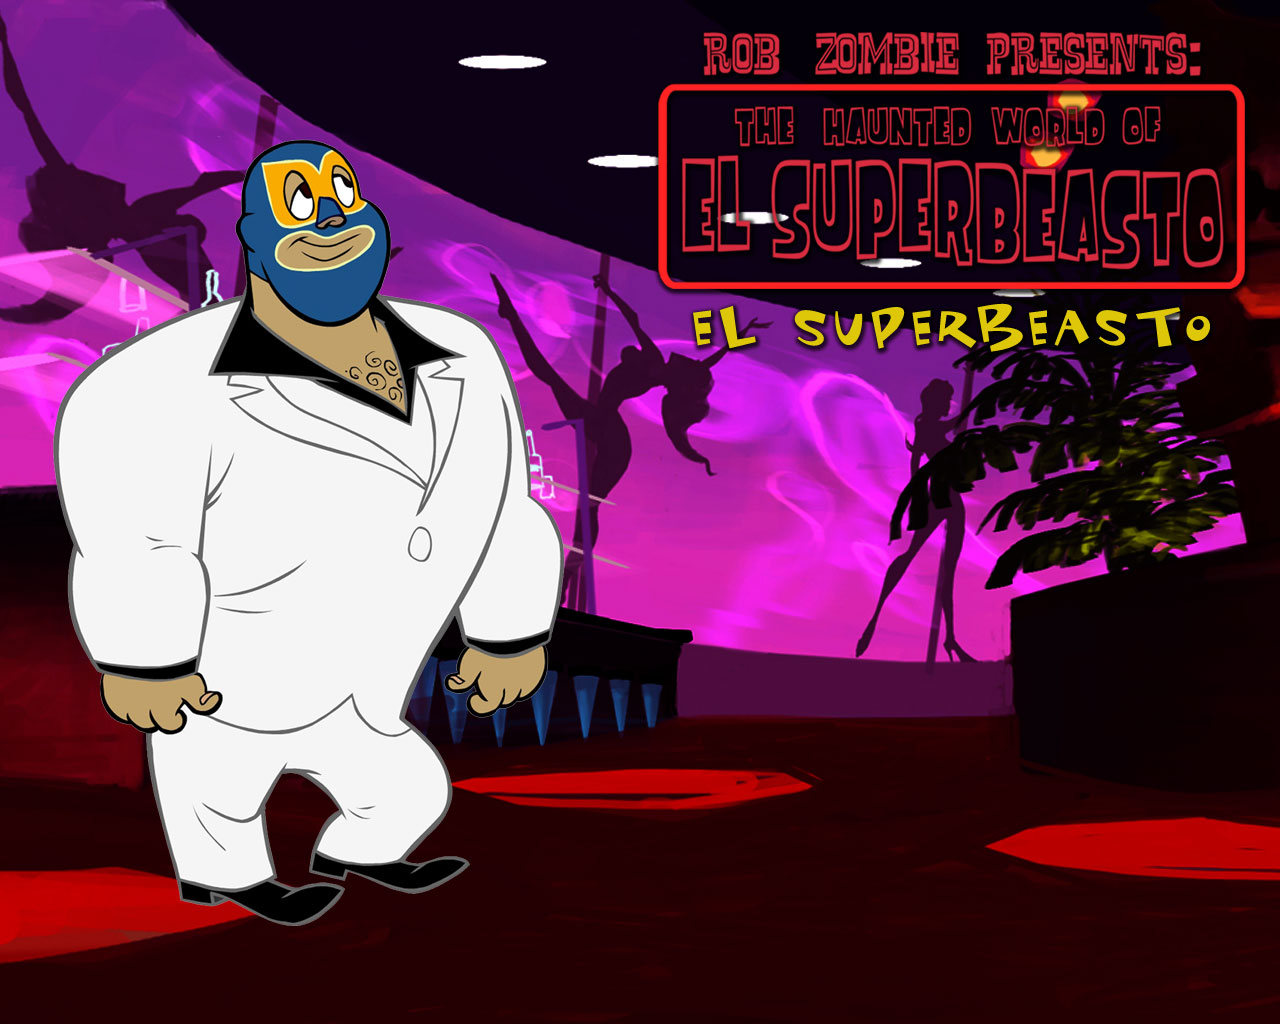 Cinematografia patologica: the haunted world of el superbeasto 2009